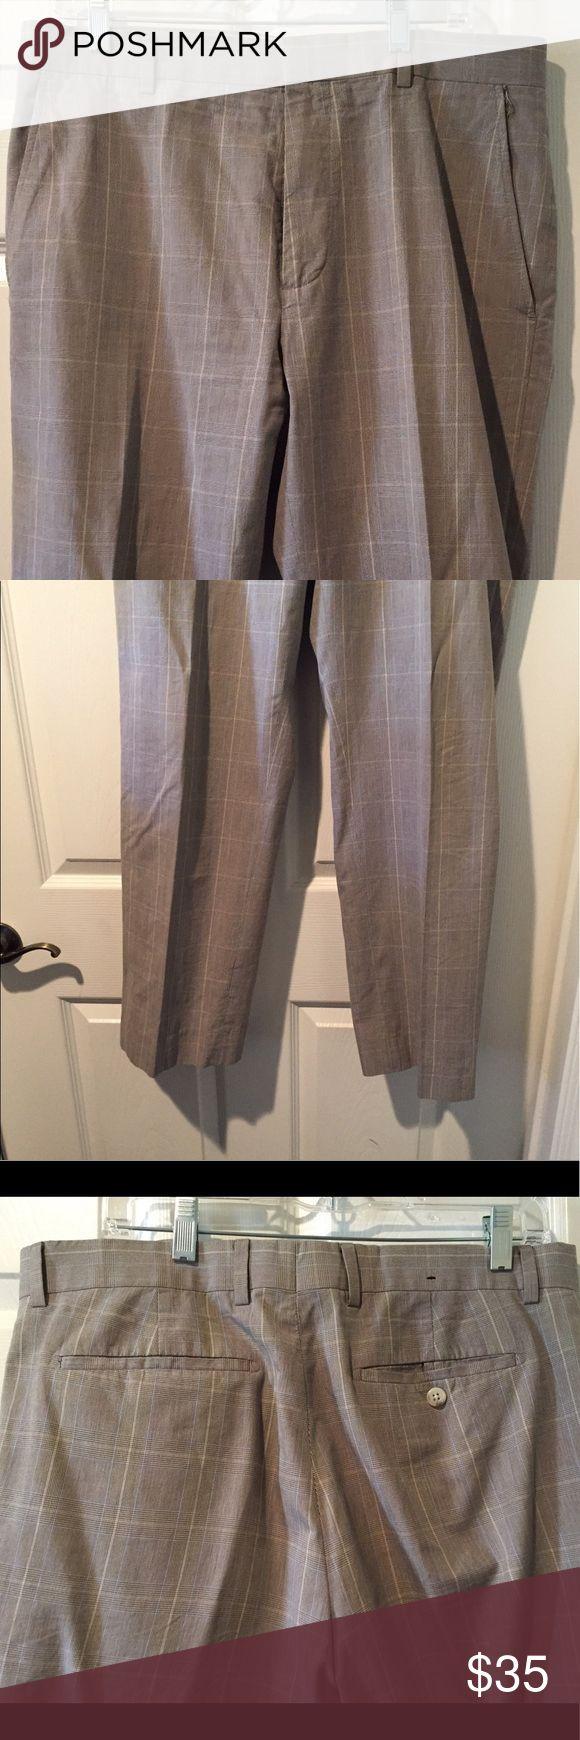 Banana Republic Men's Slacks Banana Republic Men's Slacks.  Flat front pants. Modern Fit 34/30 Banana Republic Pants Dress